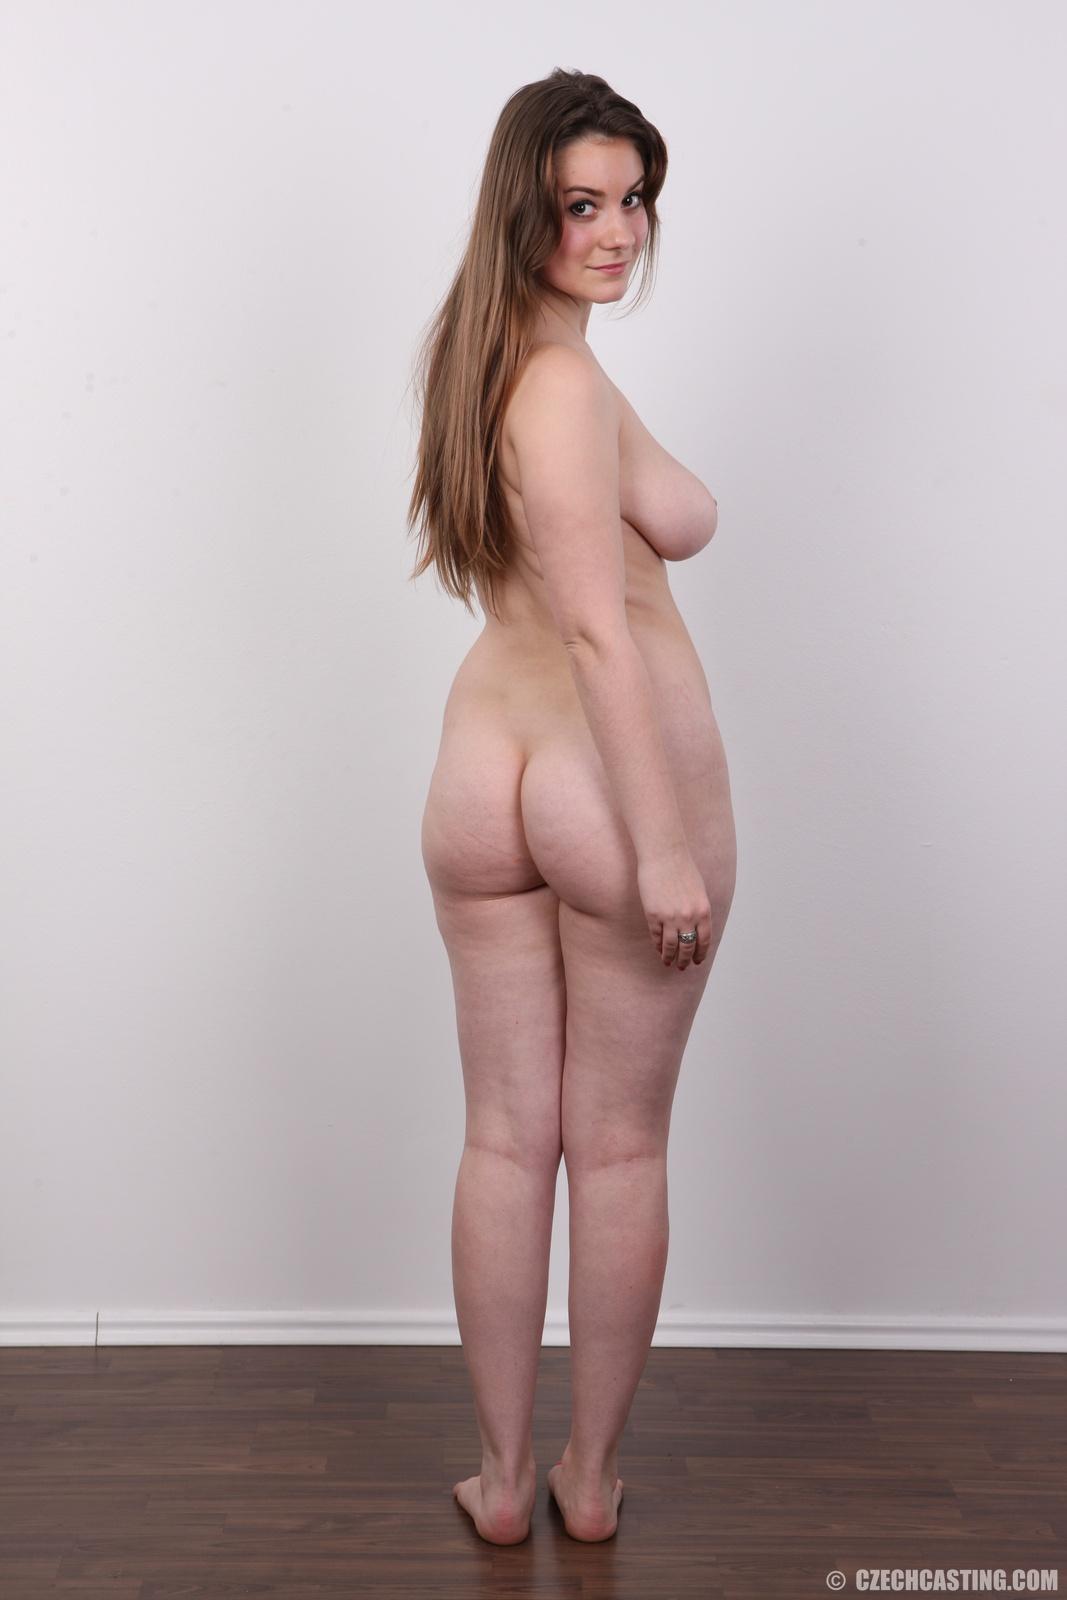 sex ostrava czech casting katerina